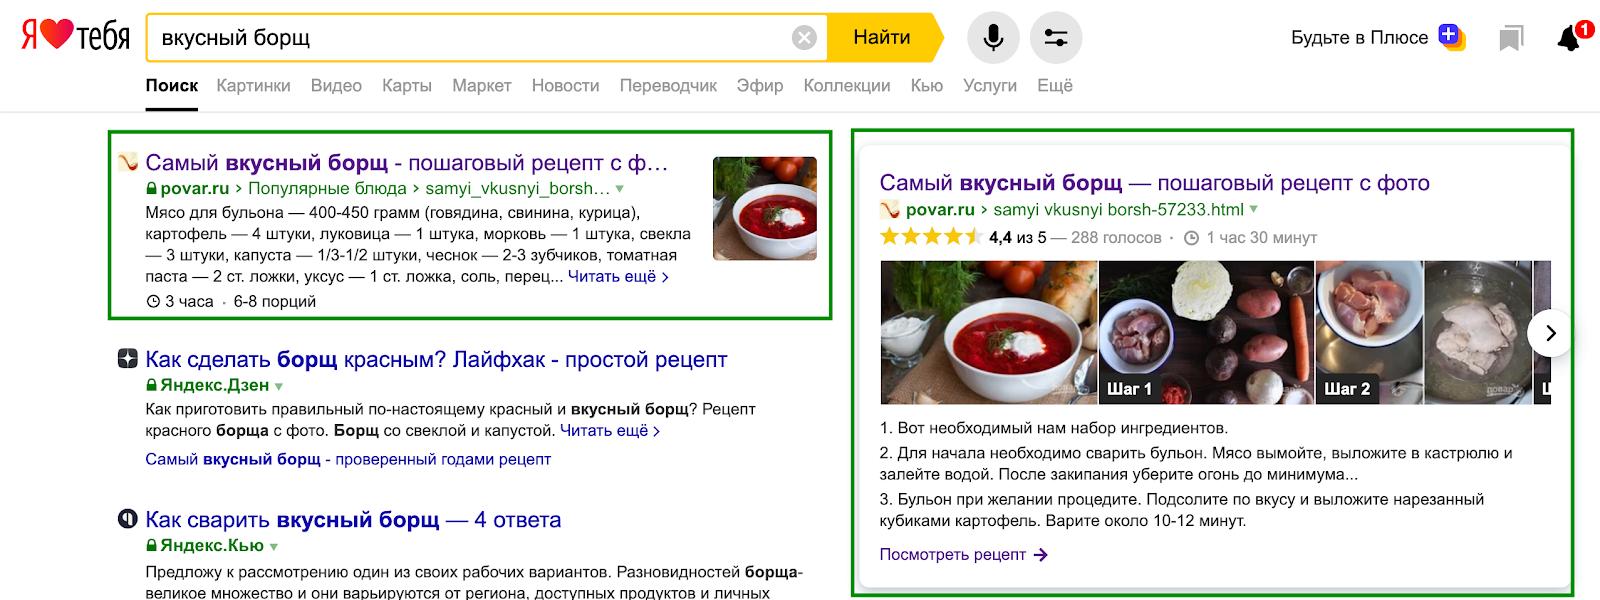 Пример расширенного сниппета в Яндексе